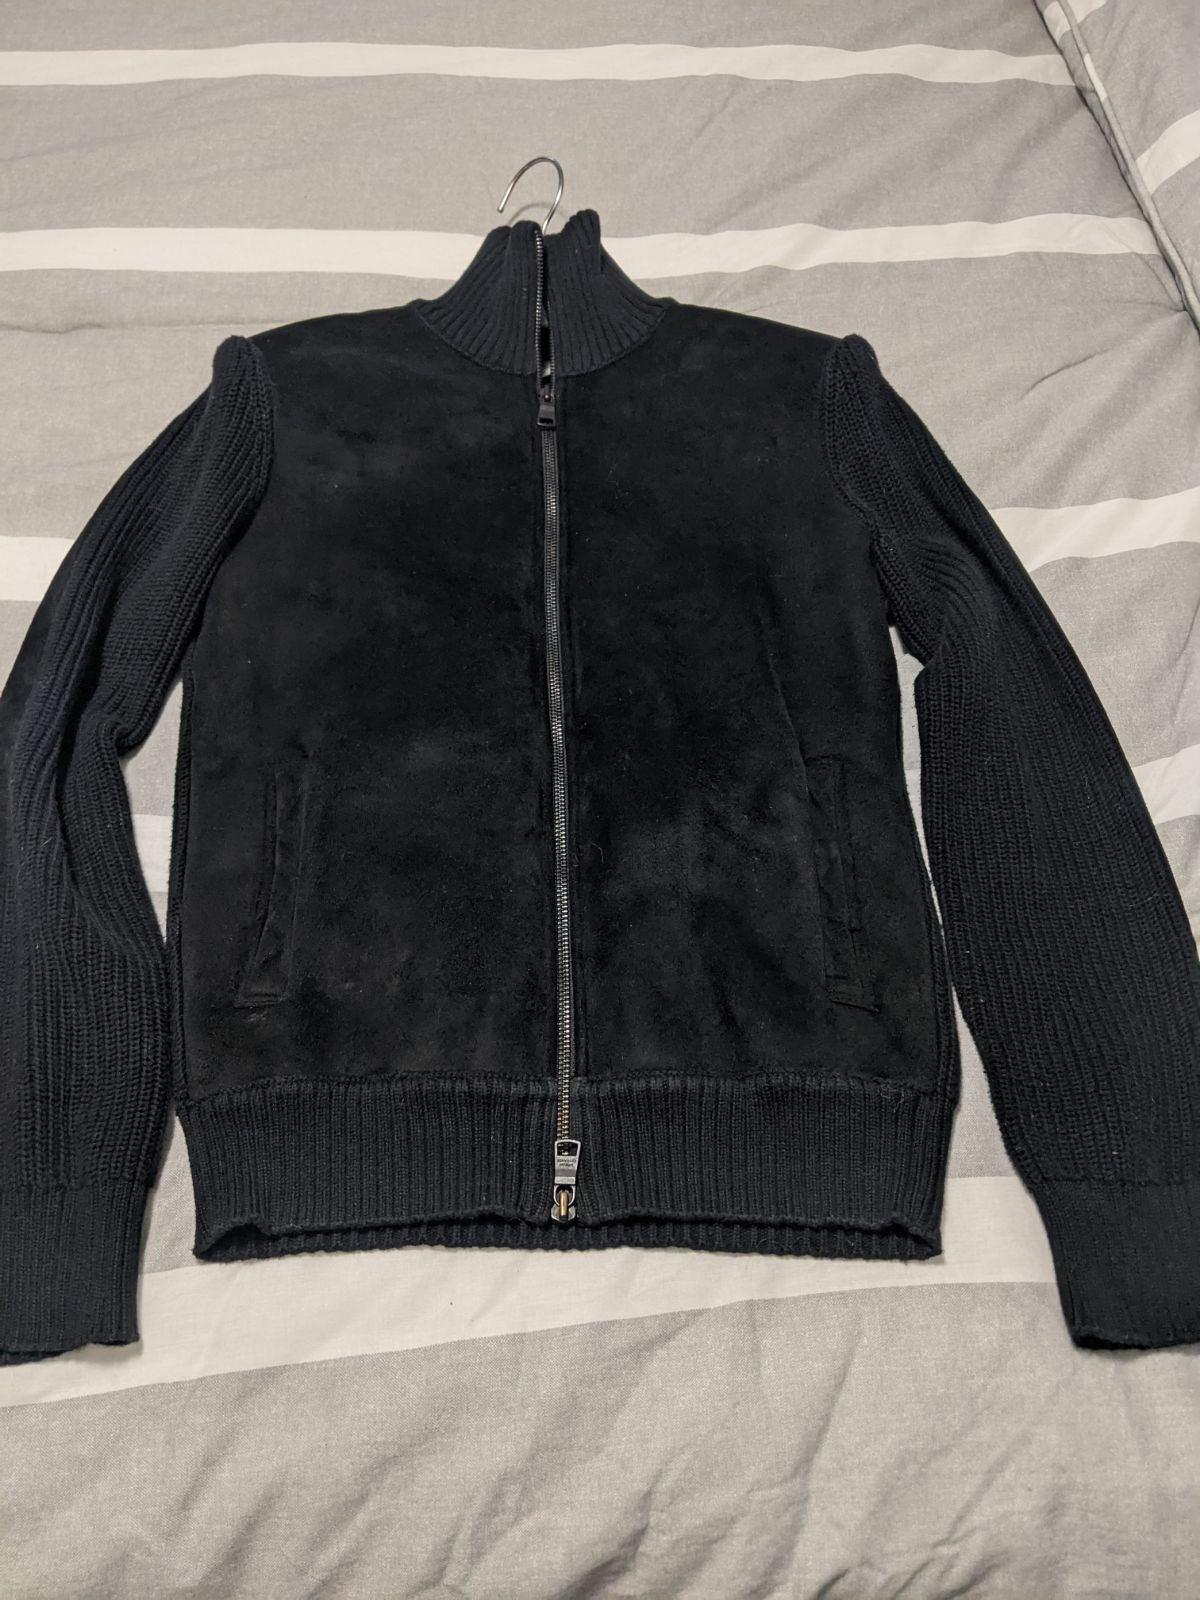 Men's Armani Exchange Jacket